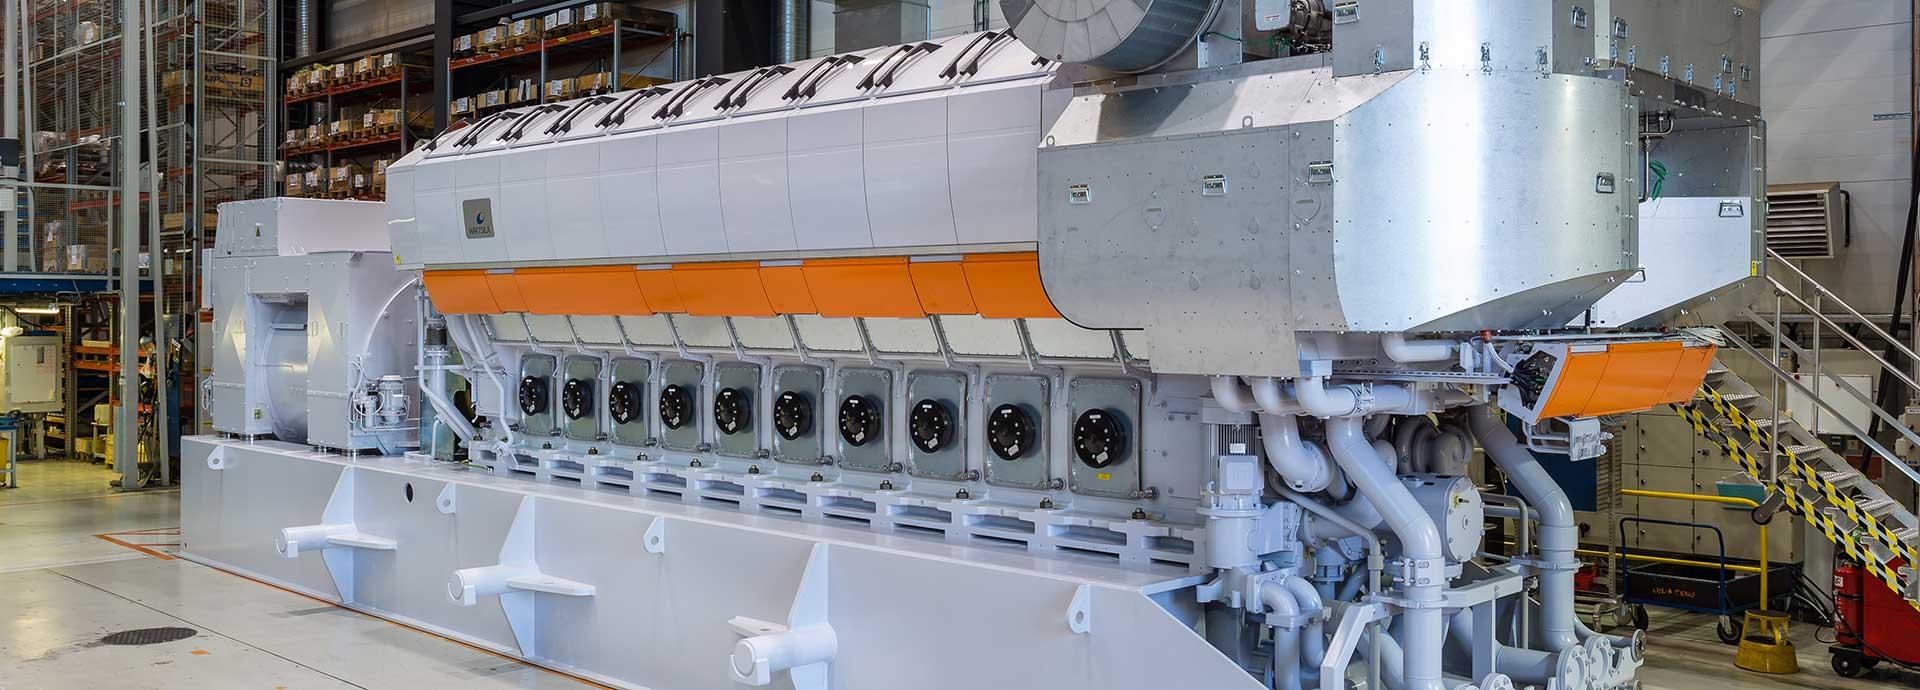 Wärtsilä eyes 15% GHG reduction from gas engines by 2020 - SAFETY4SEA